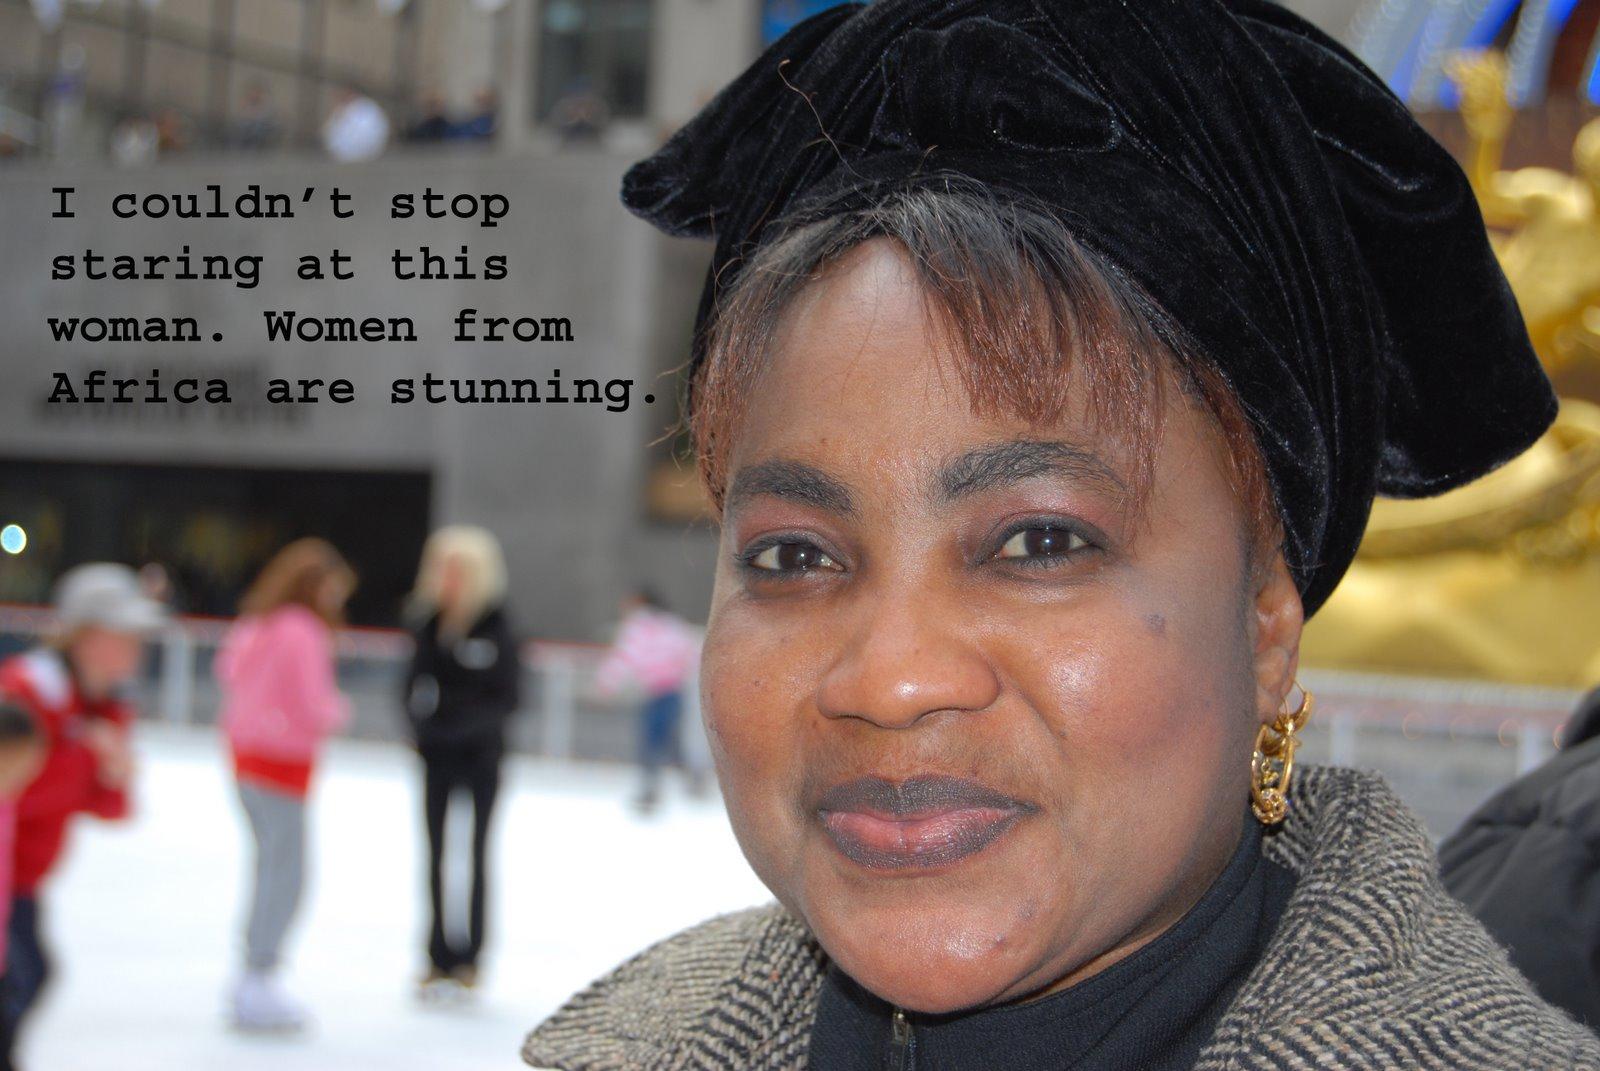 [African+woman_edited-1.jpg]